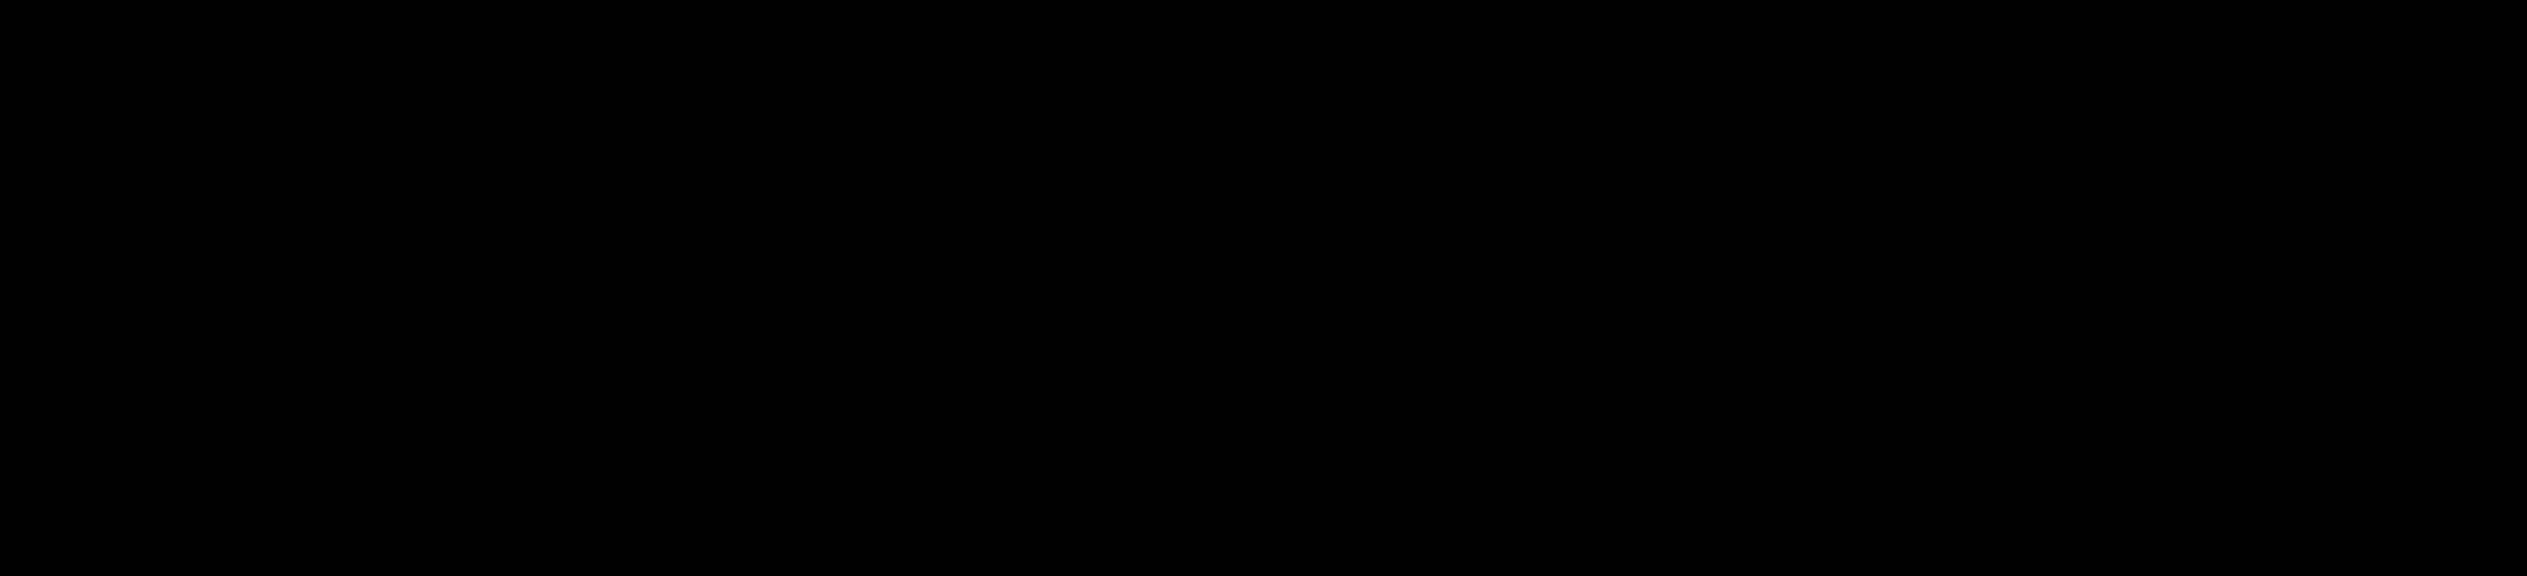 Rabæk